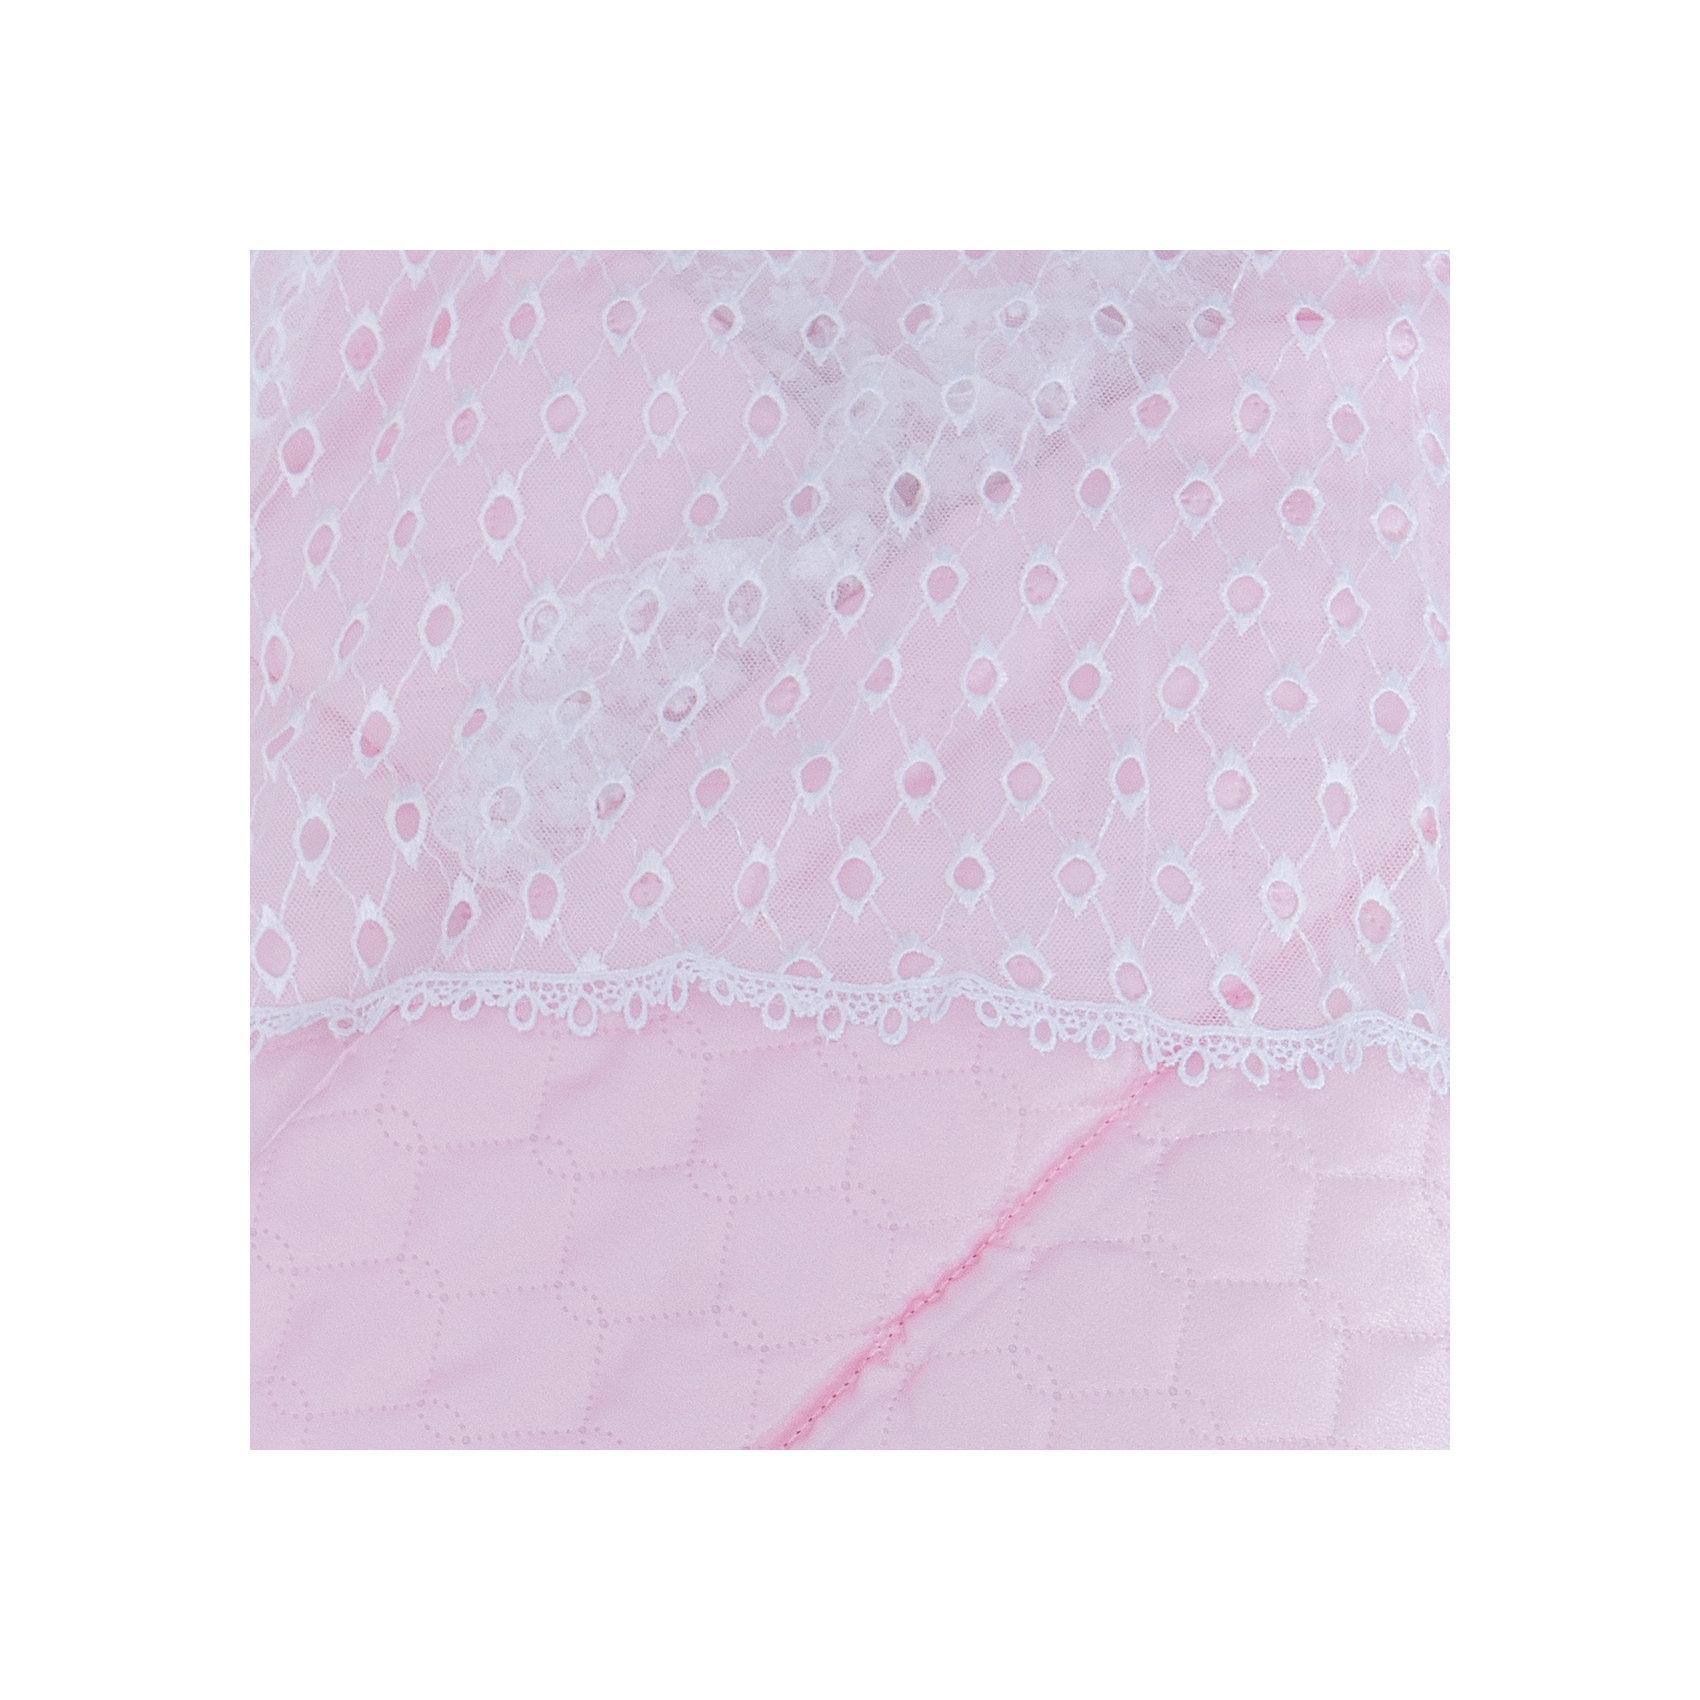 Конверт зимний, атлас., Leader kids, розовый, пакет, пвх